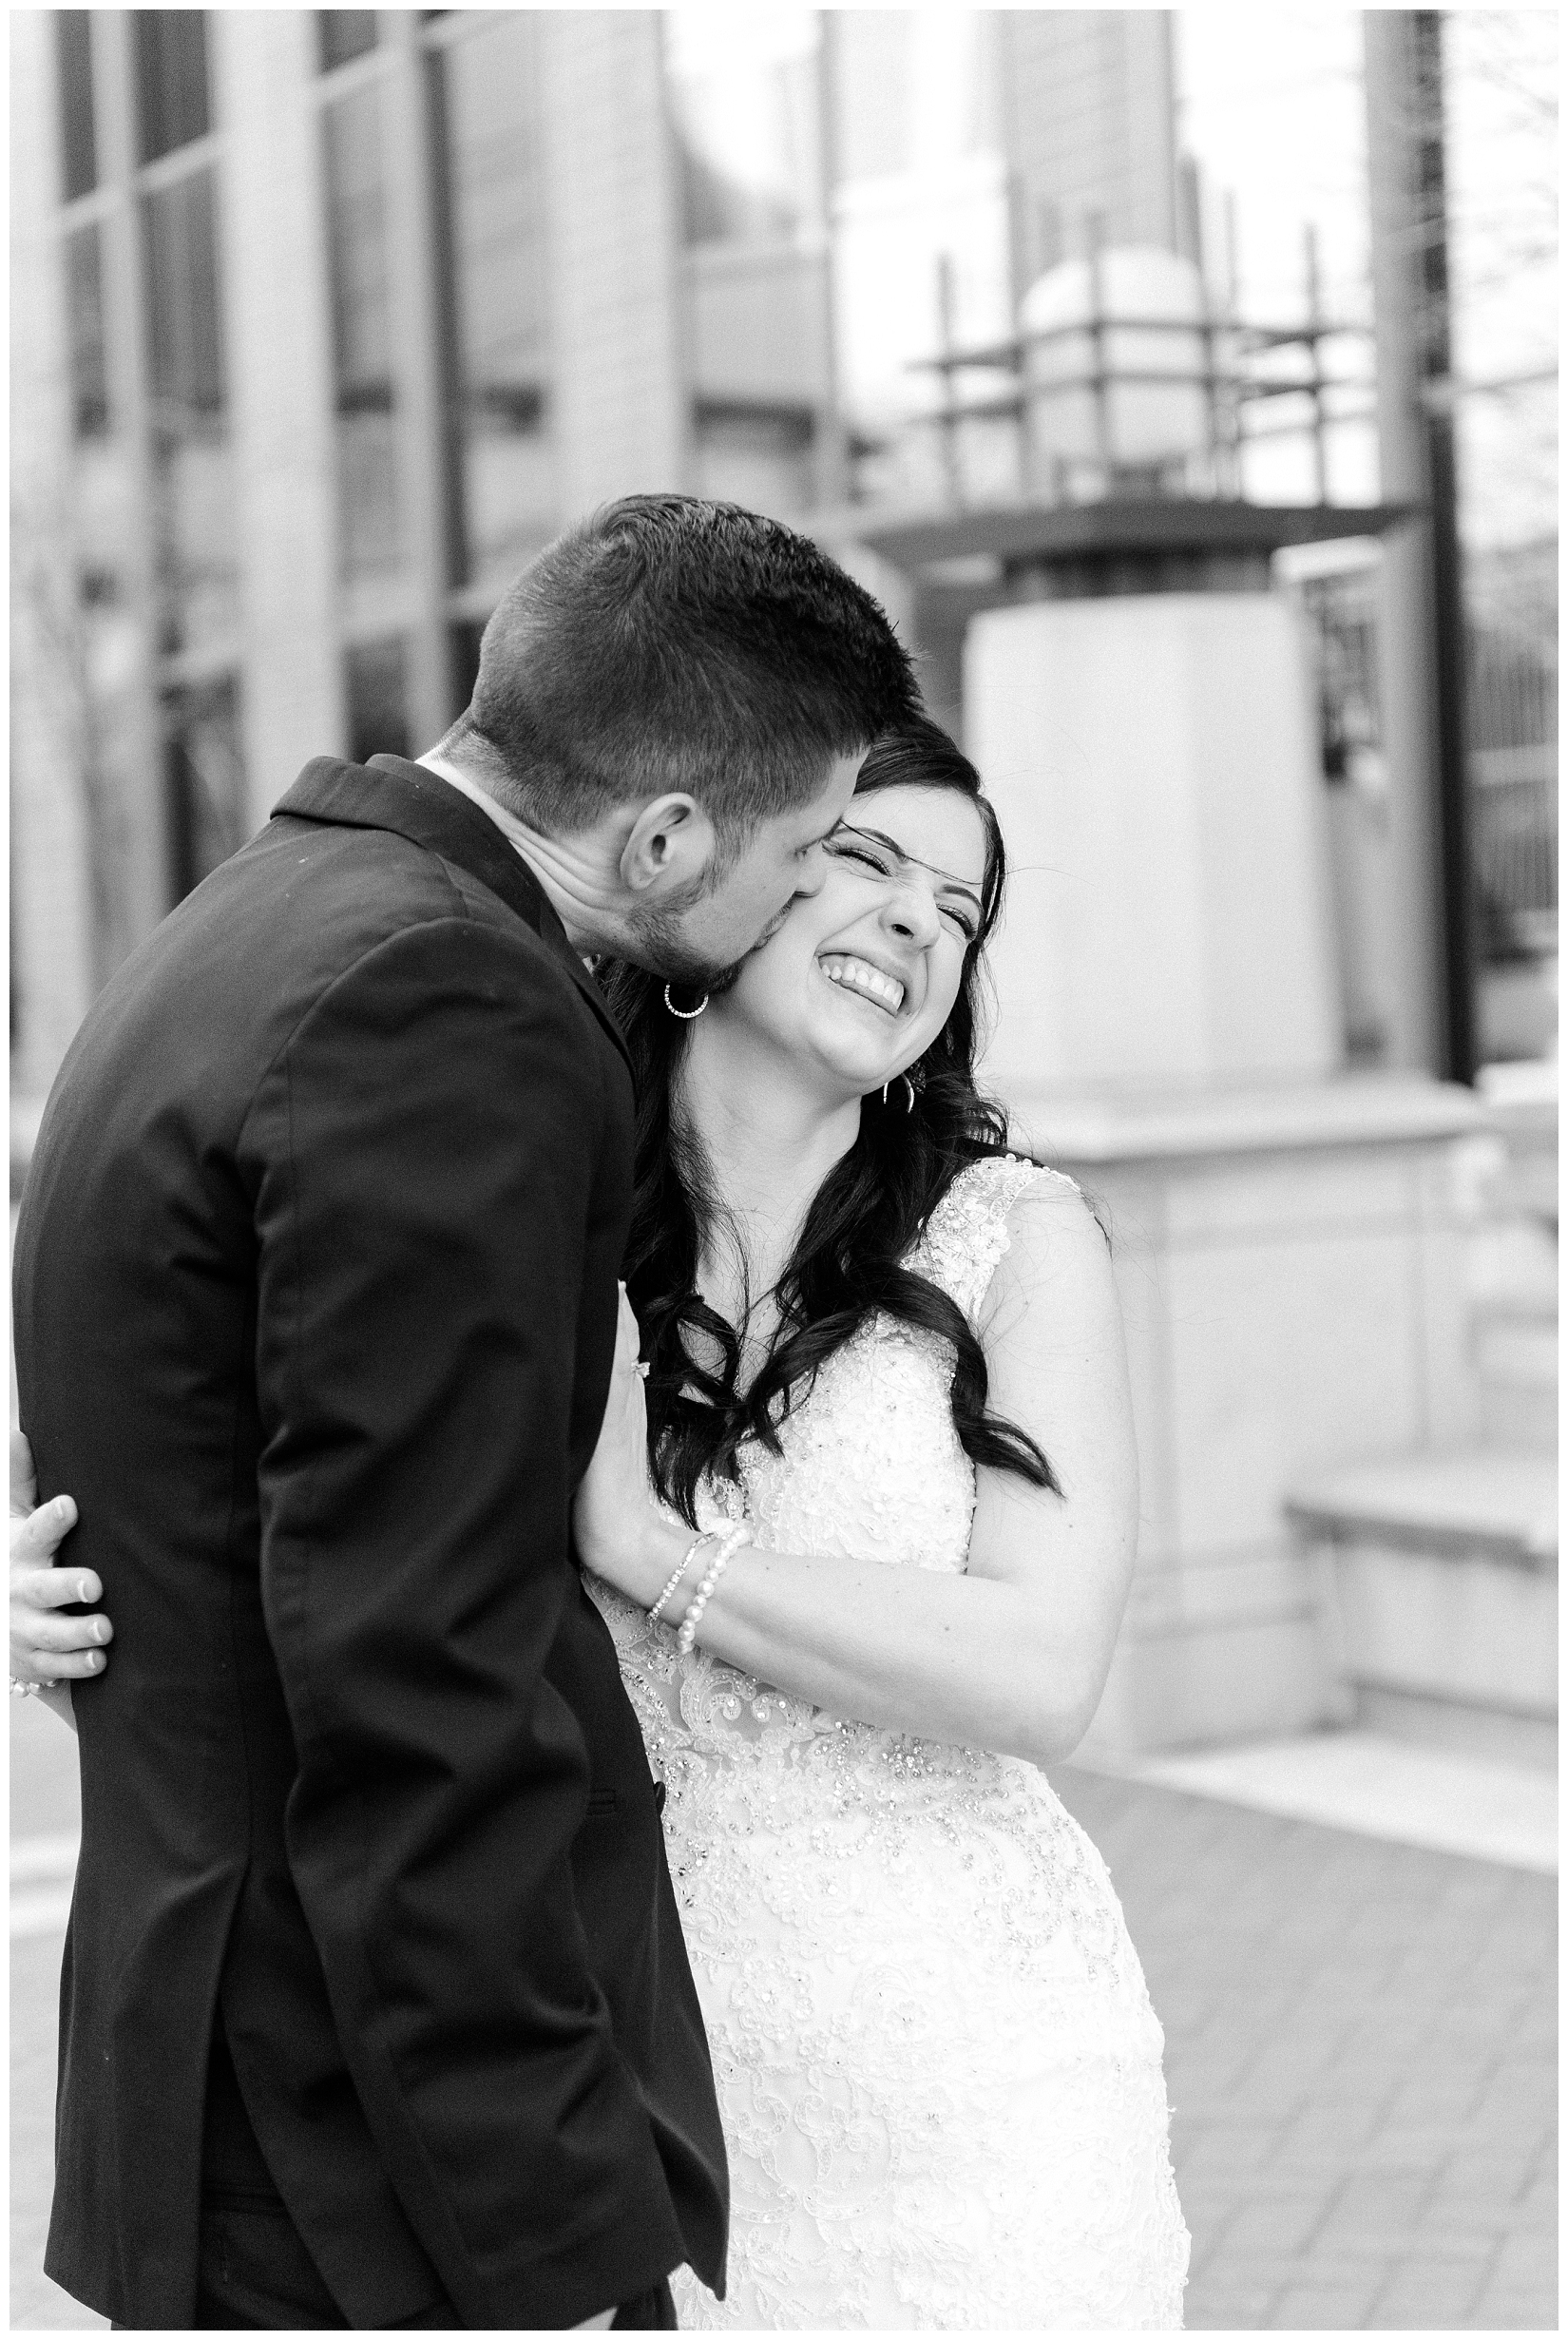 cat-alkire-wedding-photographer-indiana-chicago-indianapolis-fort-wayne_1110.jpg